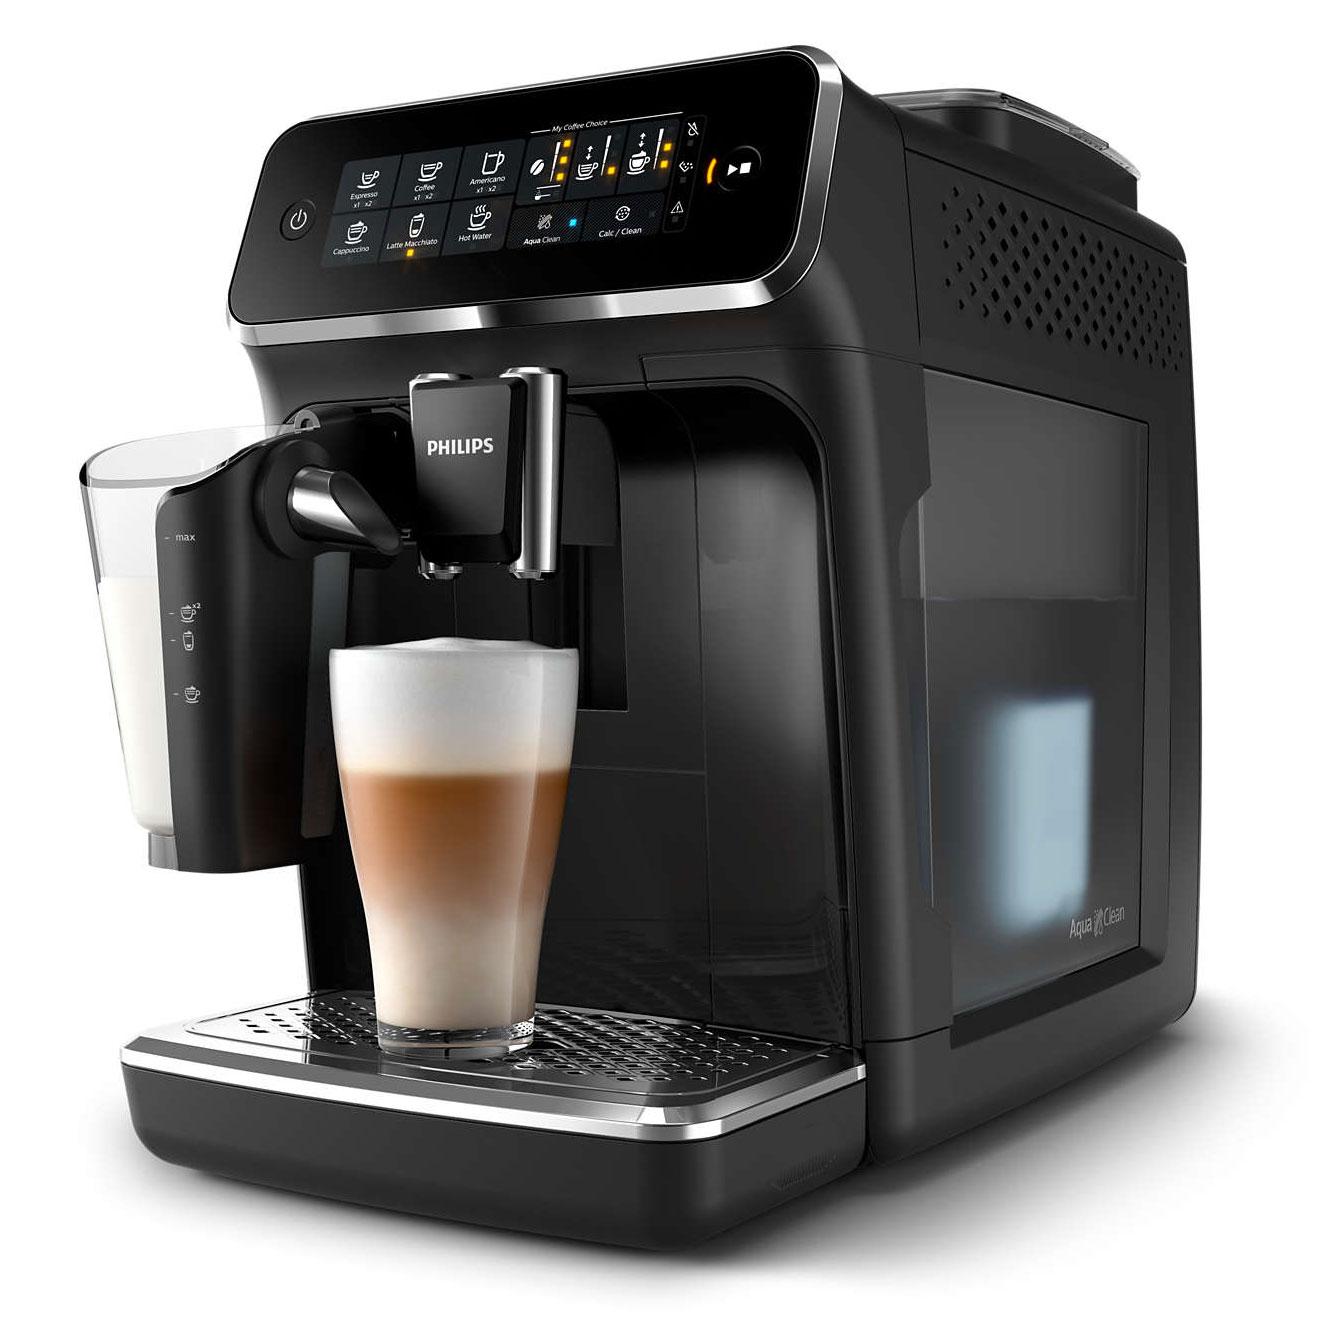 Philips / Saeco 3200 Series LatteGo Super Automatic Espresso Machine - EP3241/54